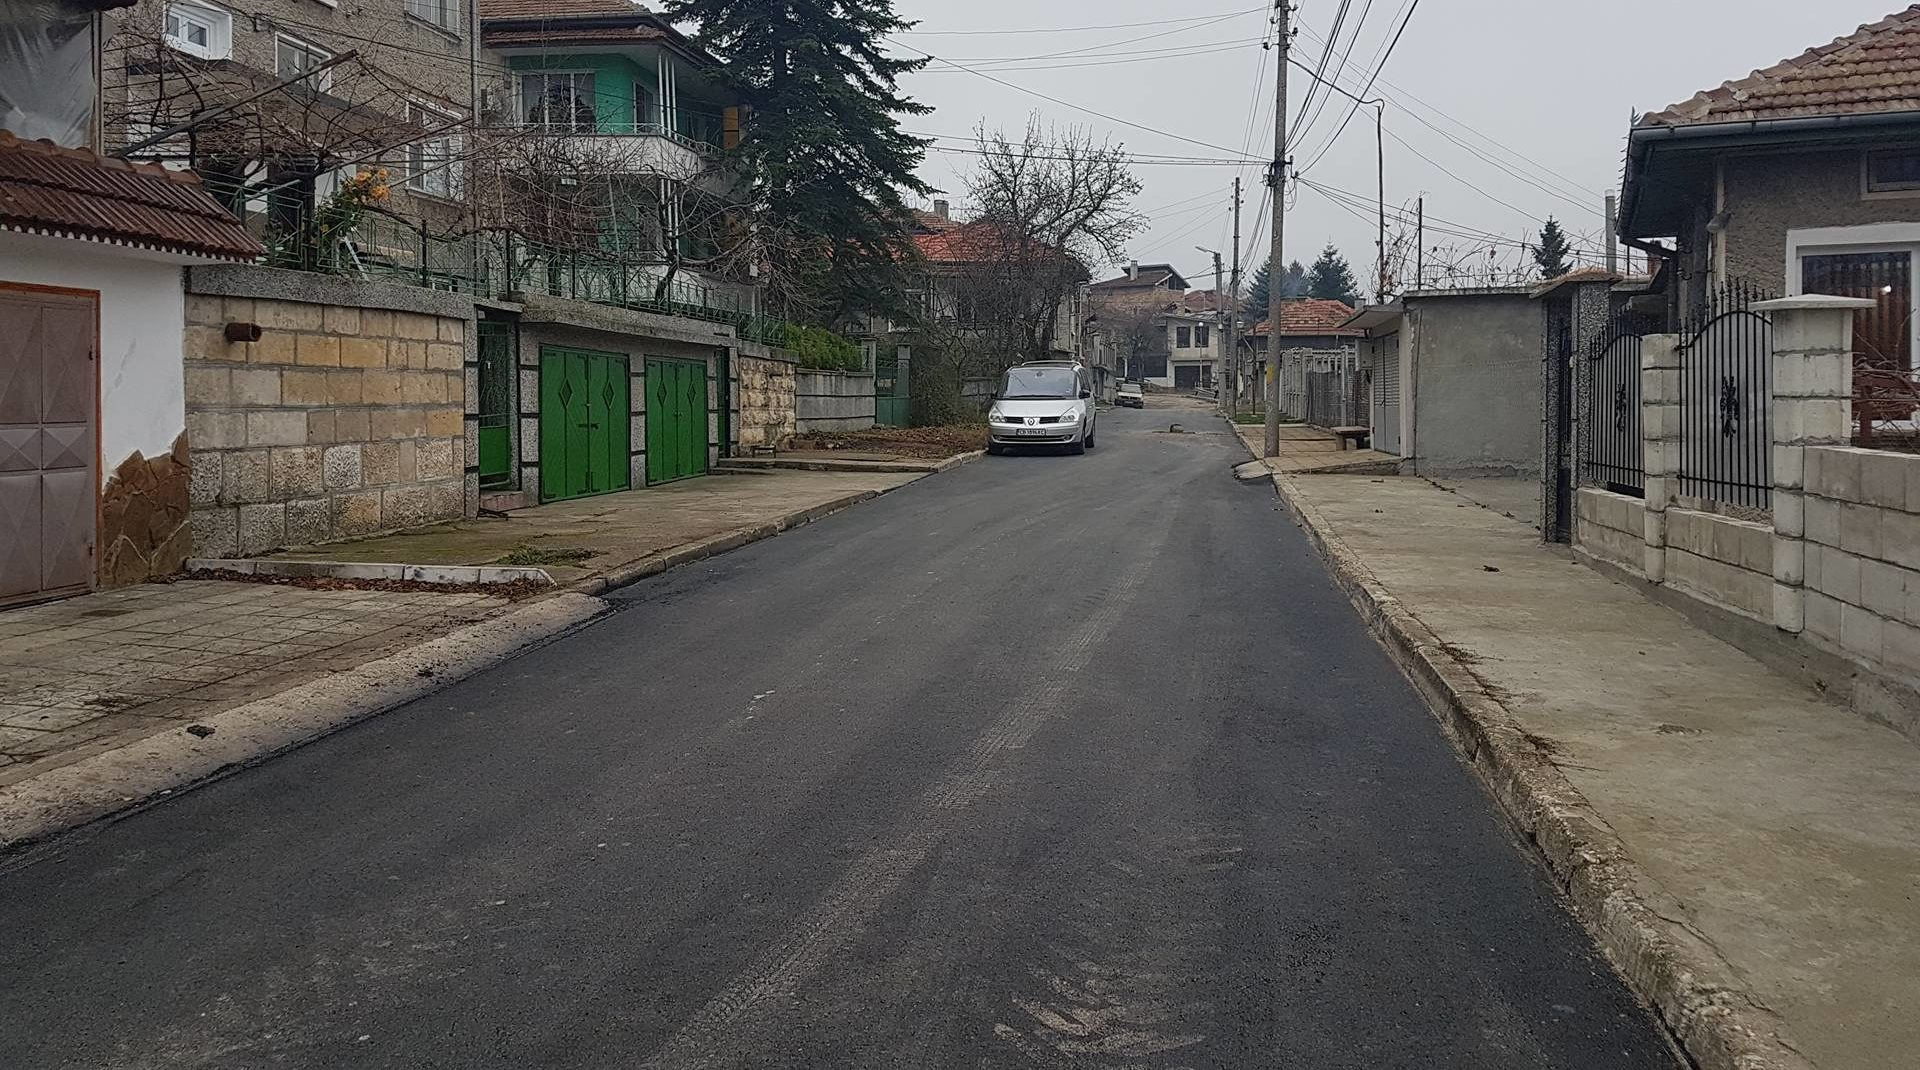 Още две асфалтирани улици и нови паркоместа за инвалид ...